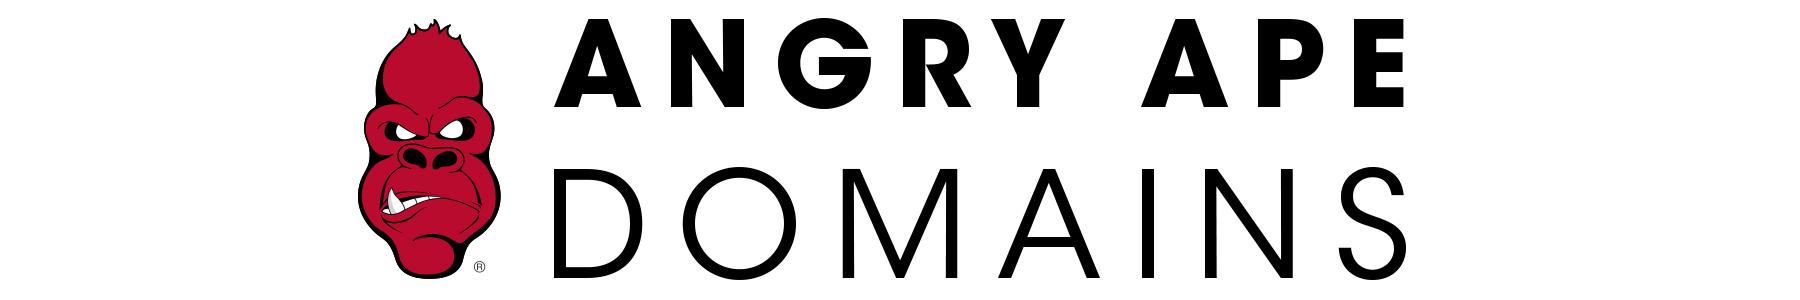 Angry Ape Domains